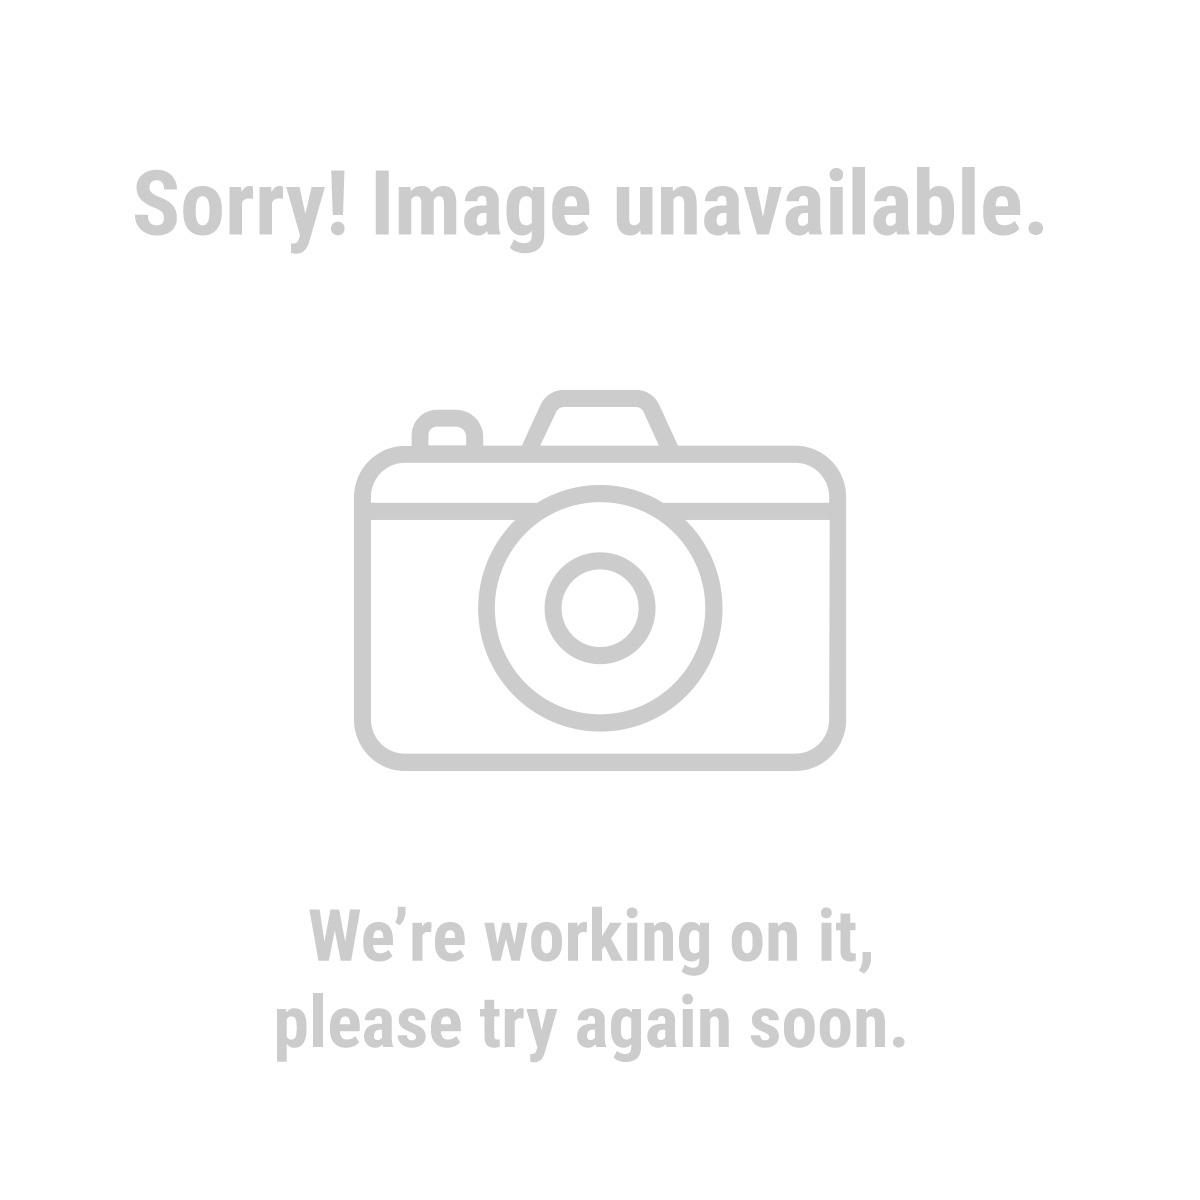 HFT 60566 27 LED Portable Worklight/Flashlight